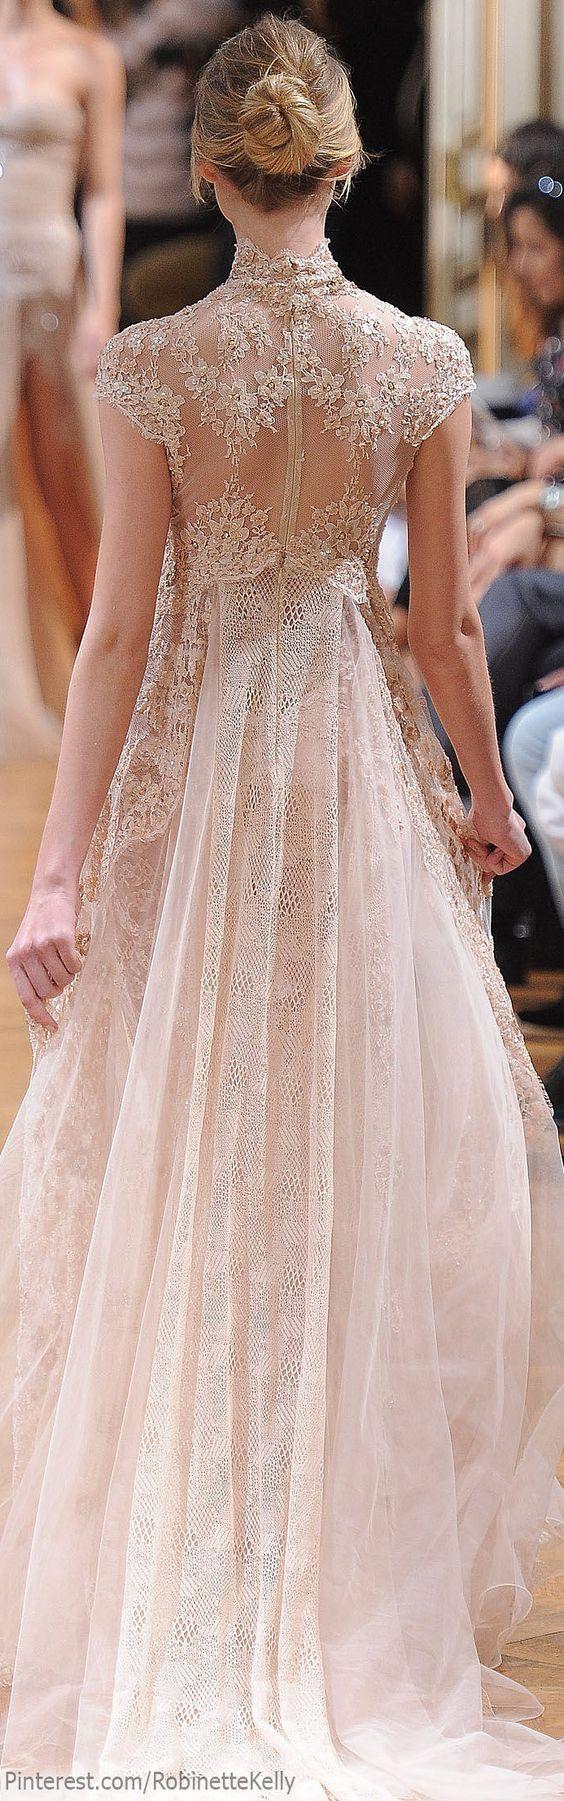 bridal dress: